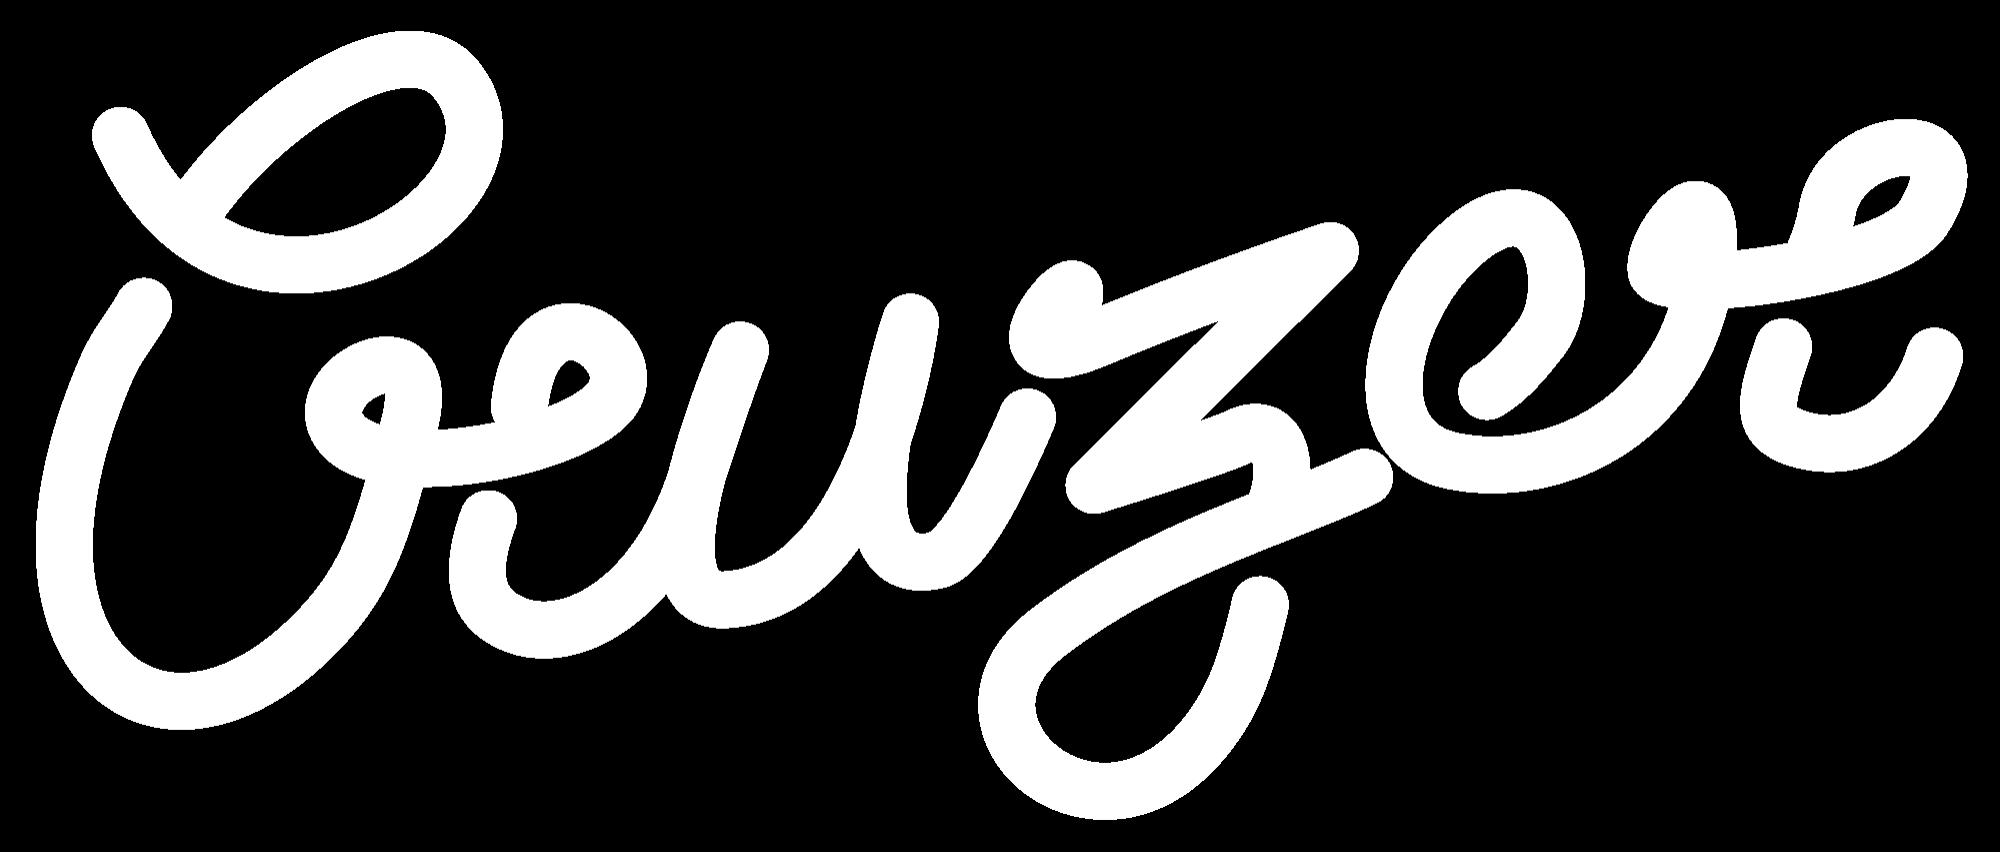 Cruzer-Logo.png